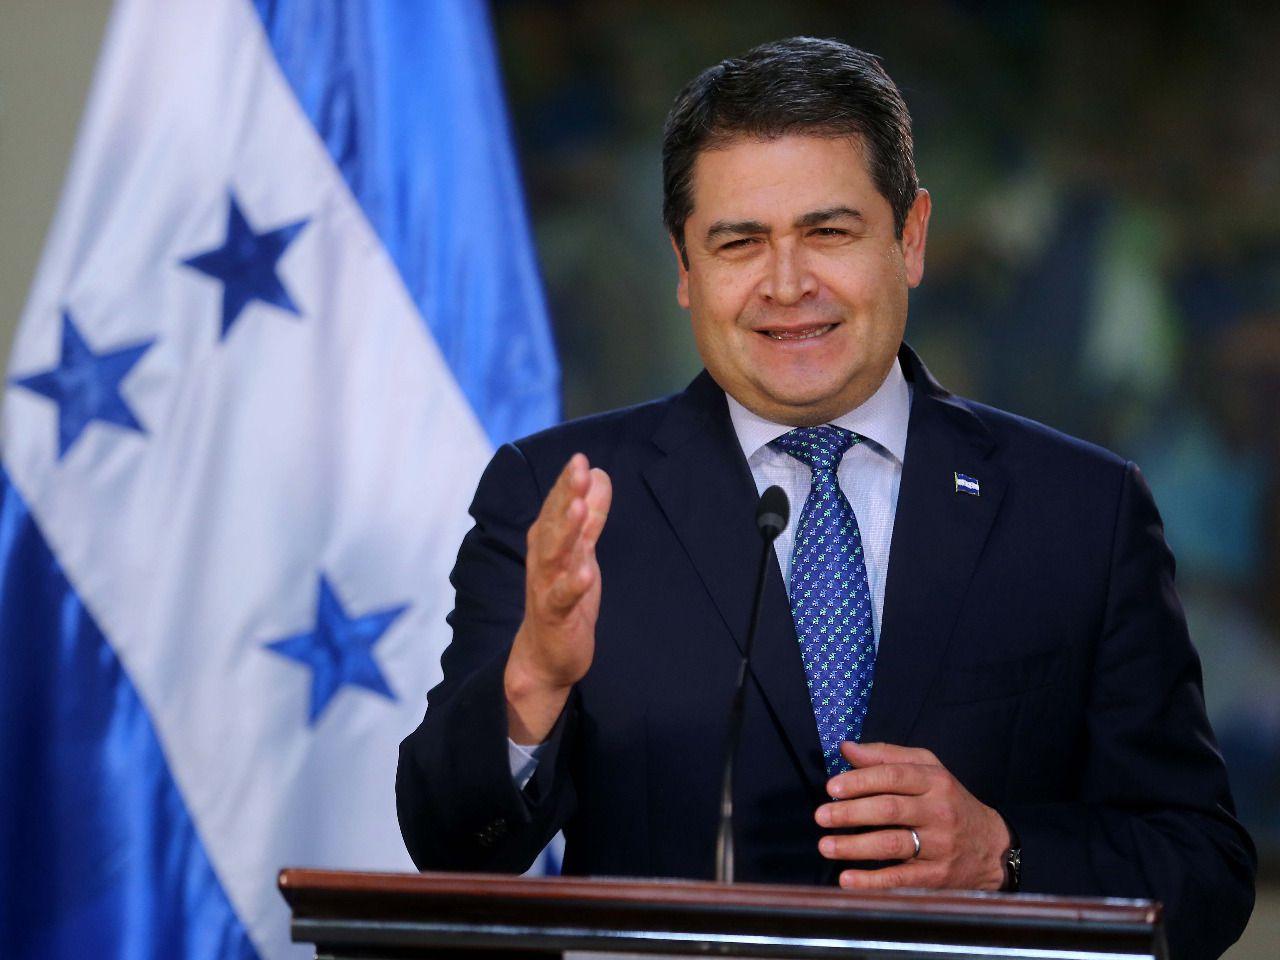 Honduras: President Juan Orlando Hernández reports that he has covid-19